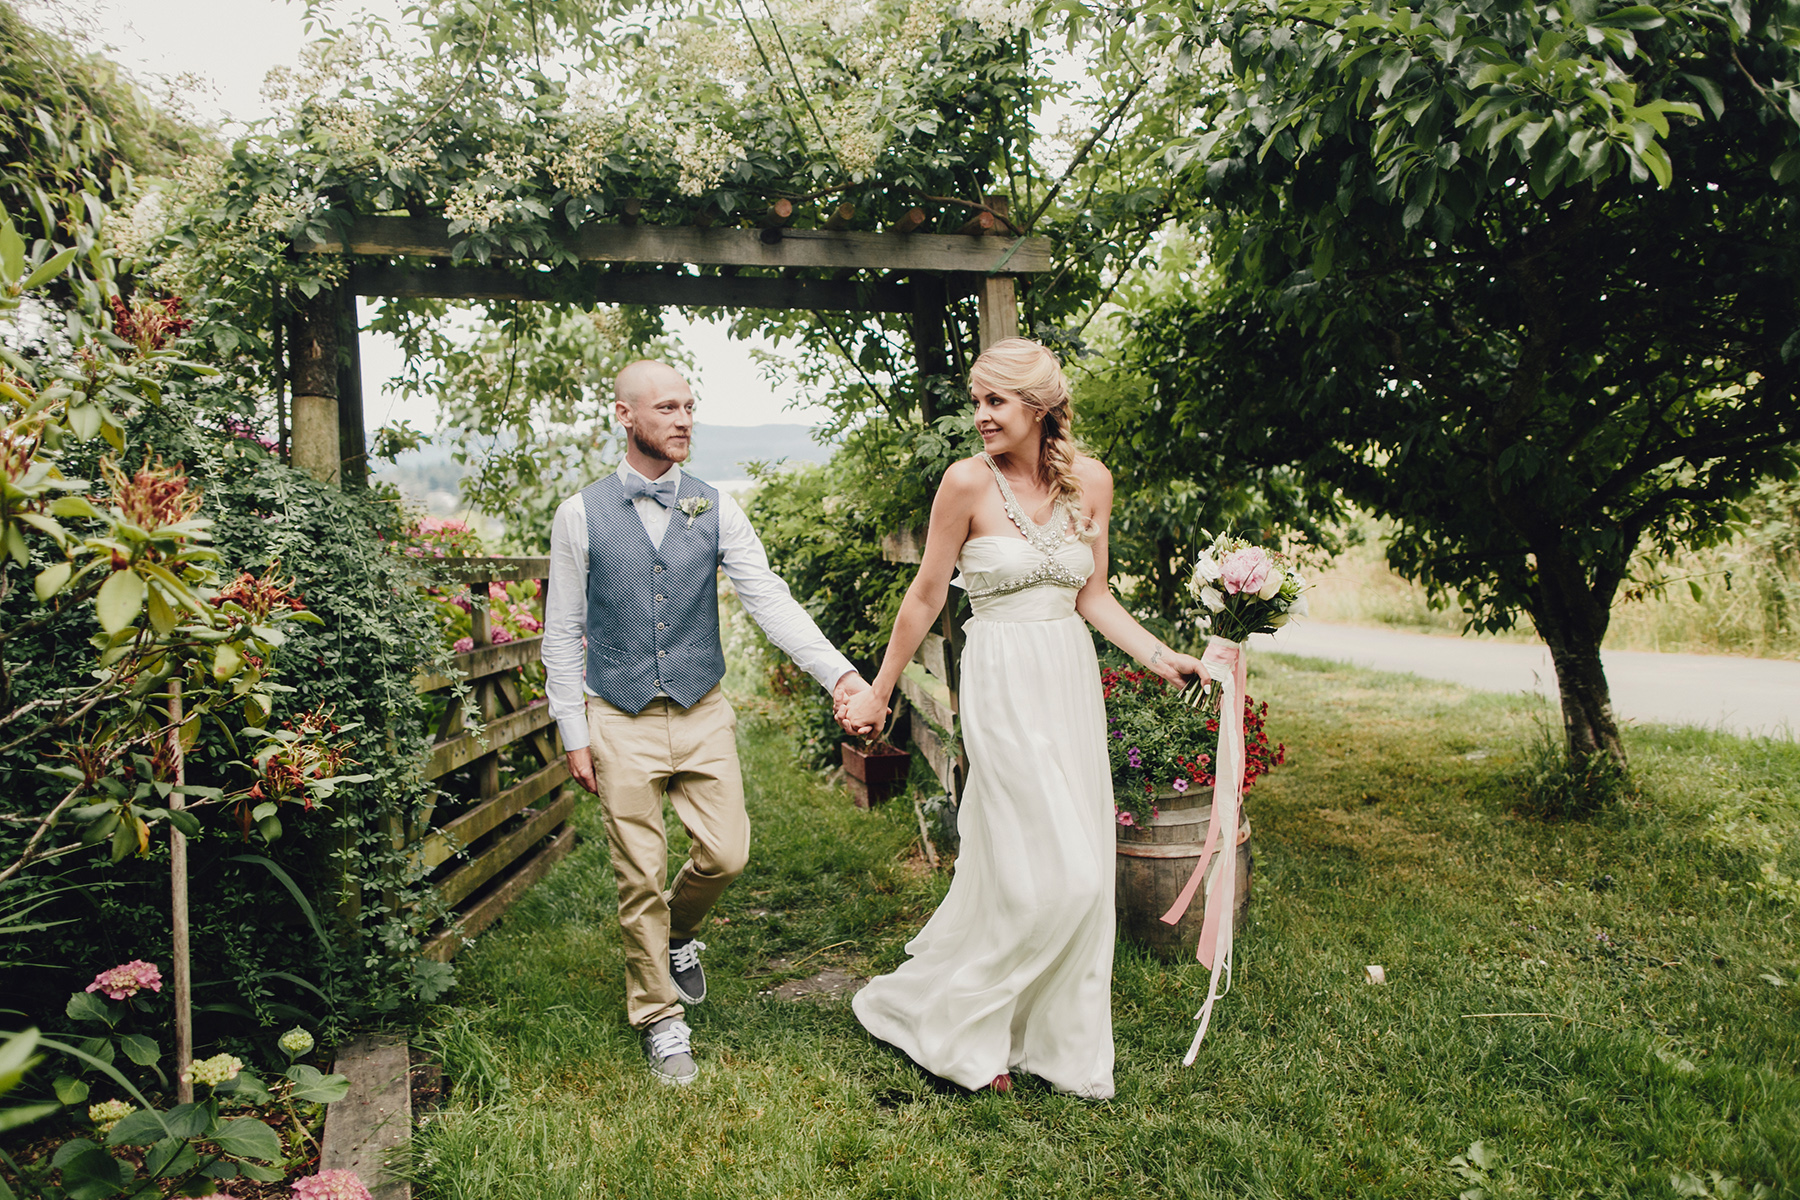 kildara-farms-wedding-photo-inspiration-0075